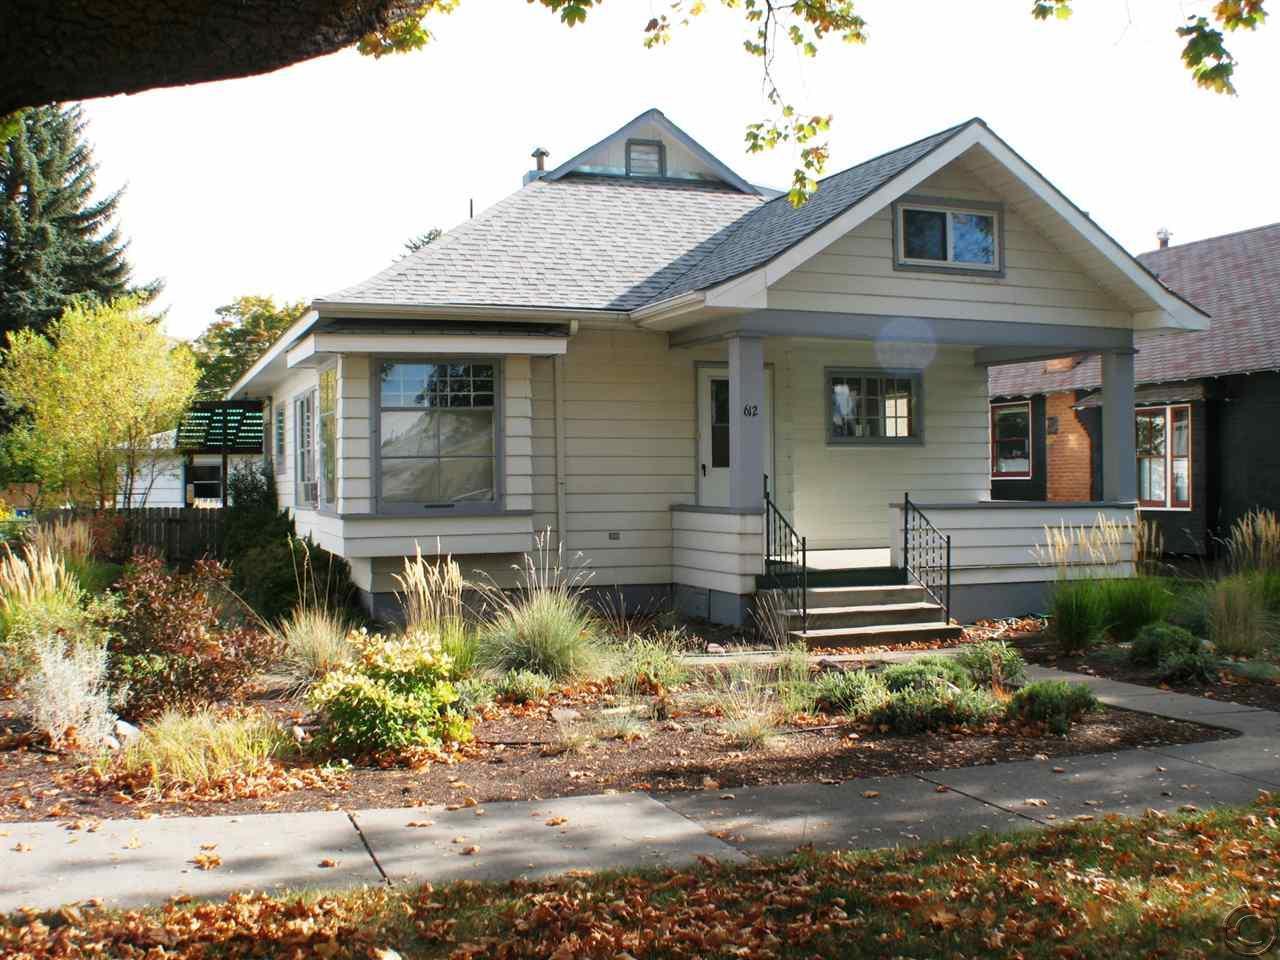 612 Brooks St, Missoula, MT 59801